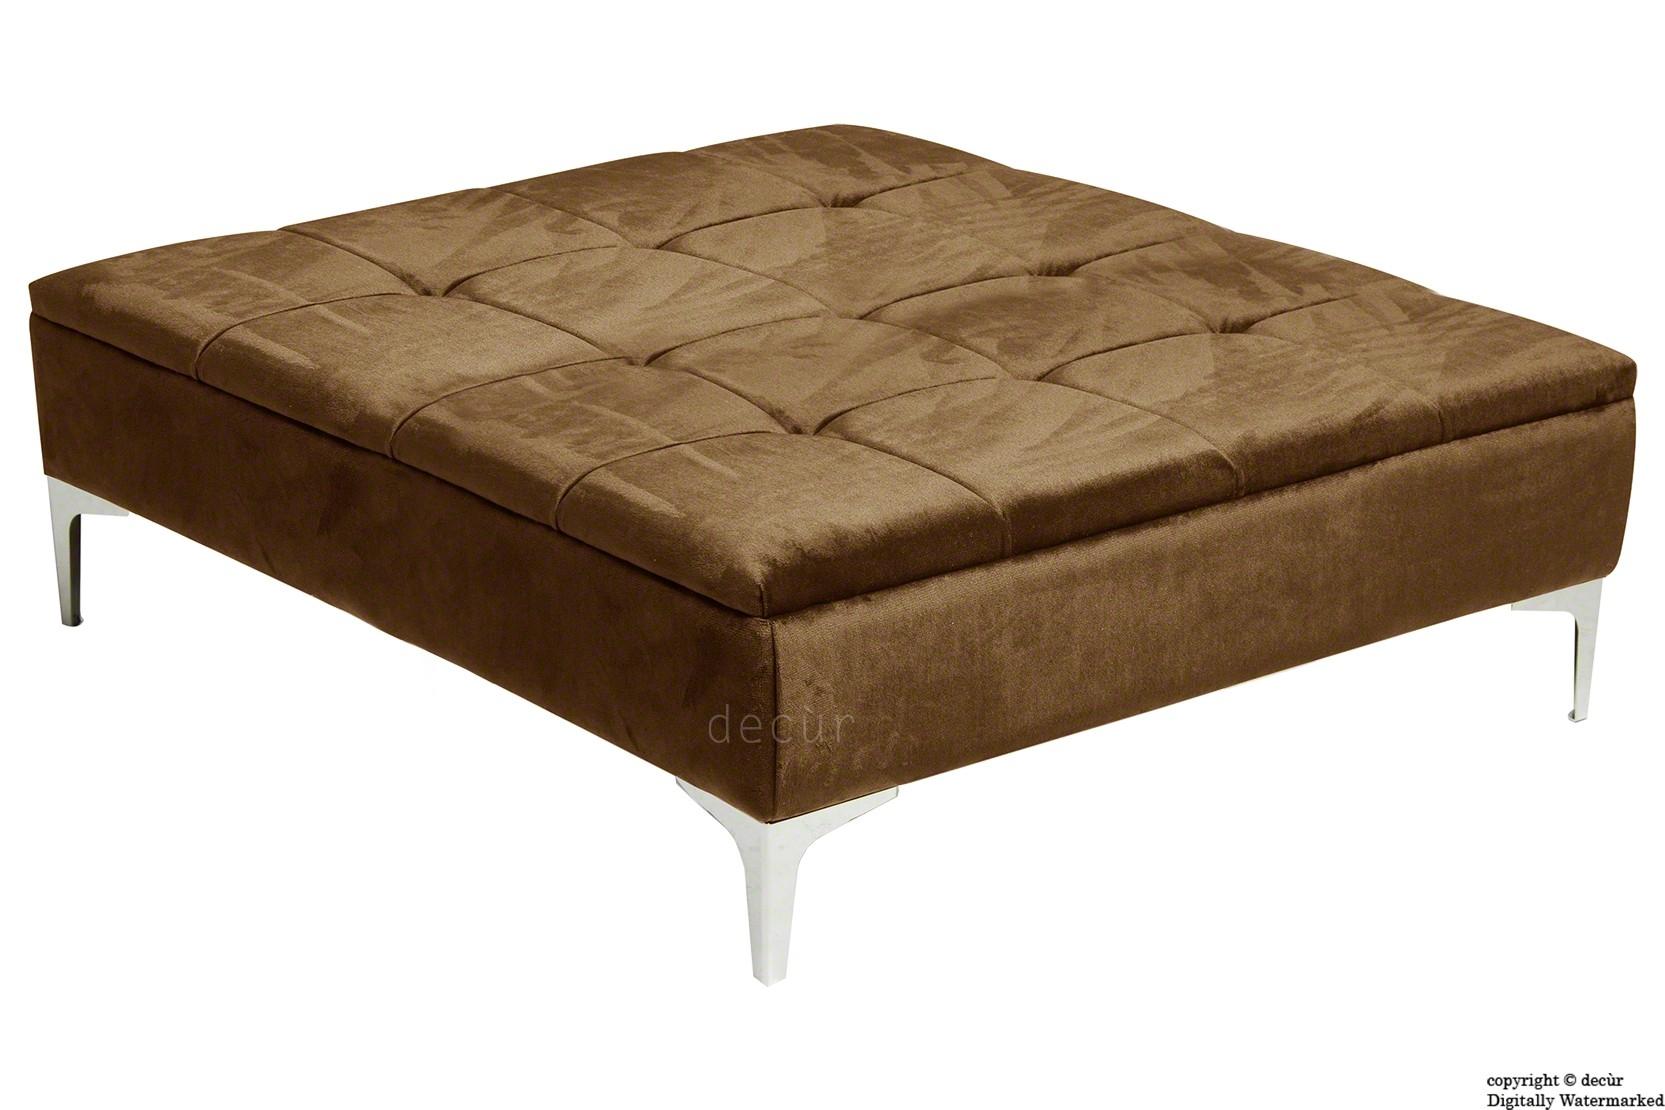 Bespoke Designer Sofas Footstools Bespoke Footstools Bespoke Inside Large Footstools (Image 3 of 15)